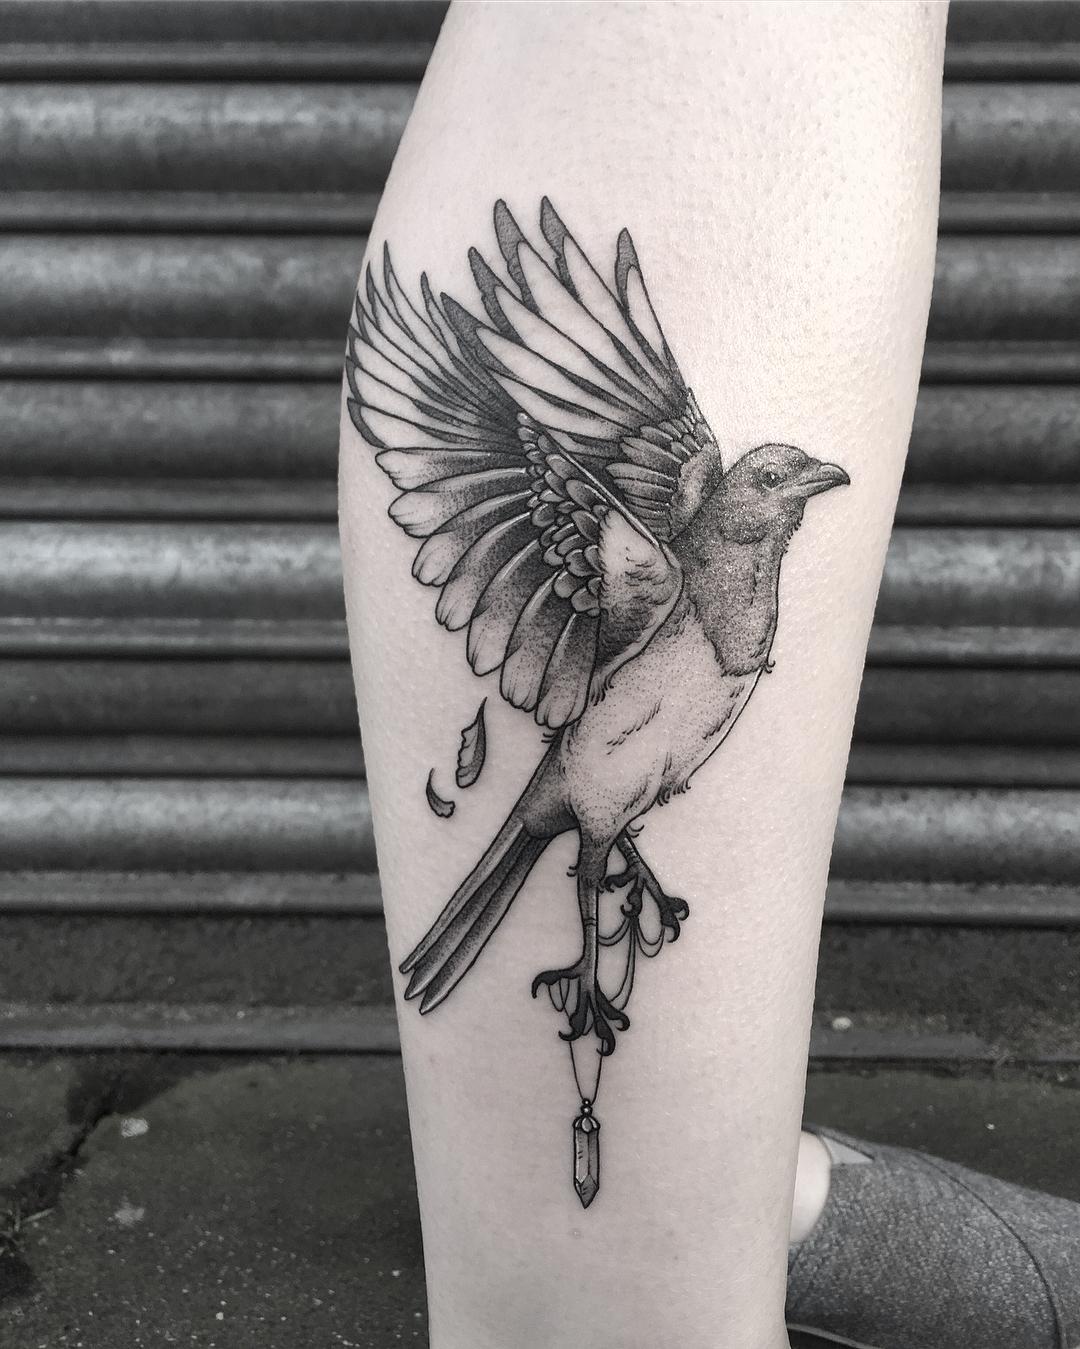 Magpie tattoo by Lozzy Bones